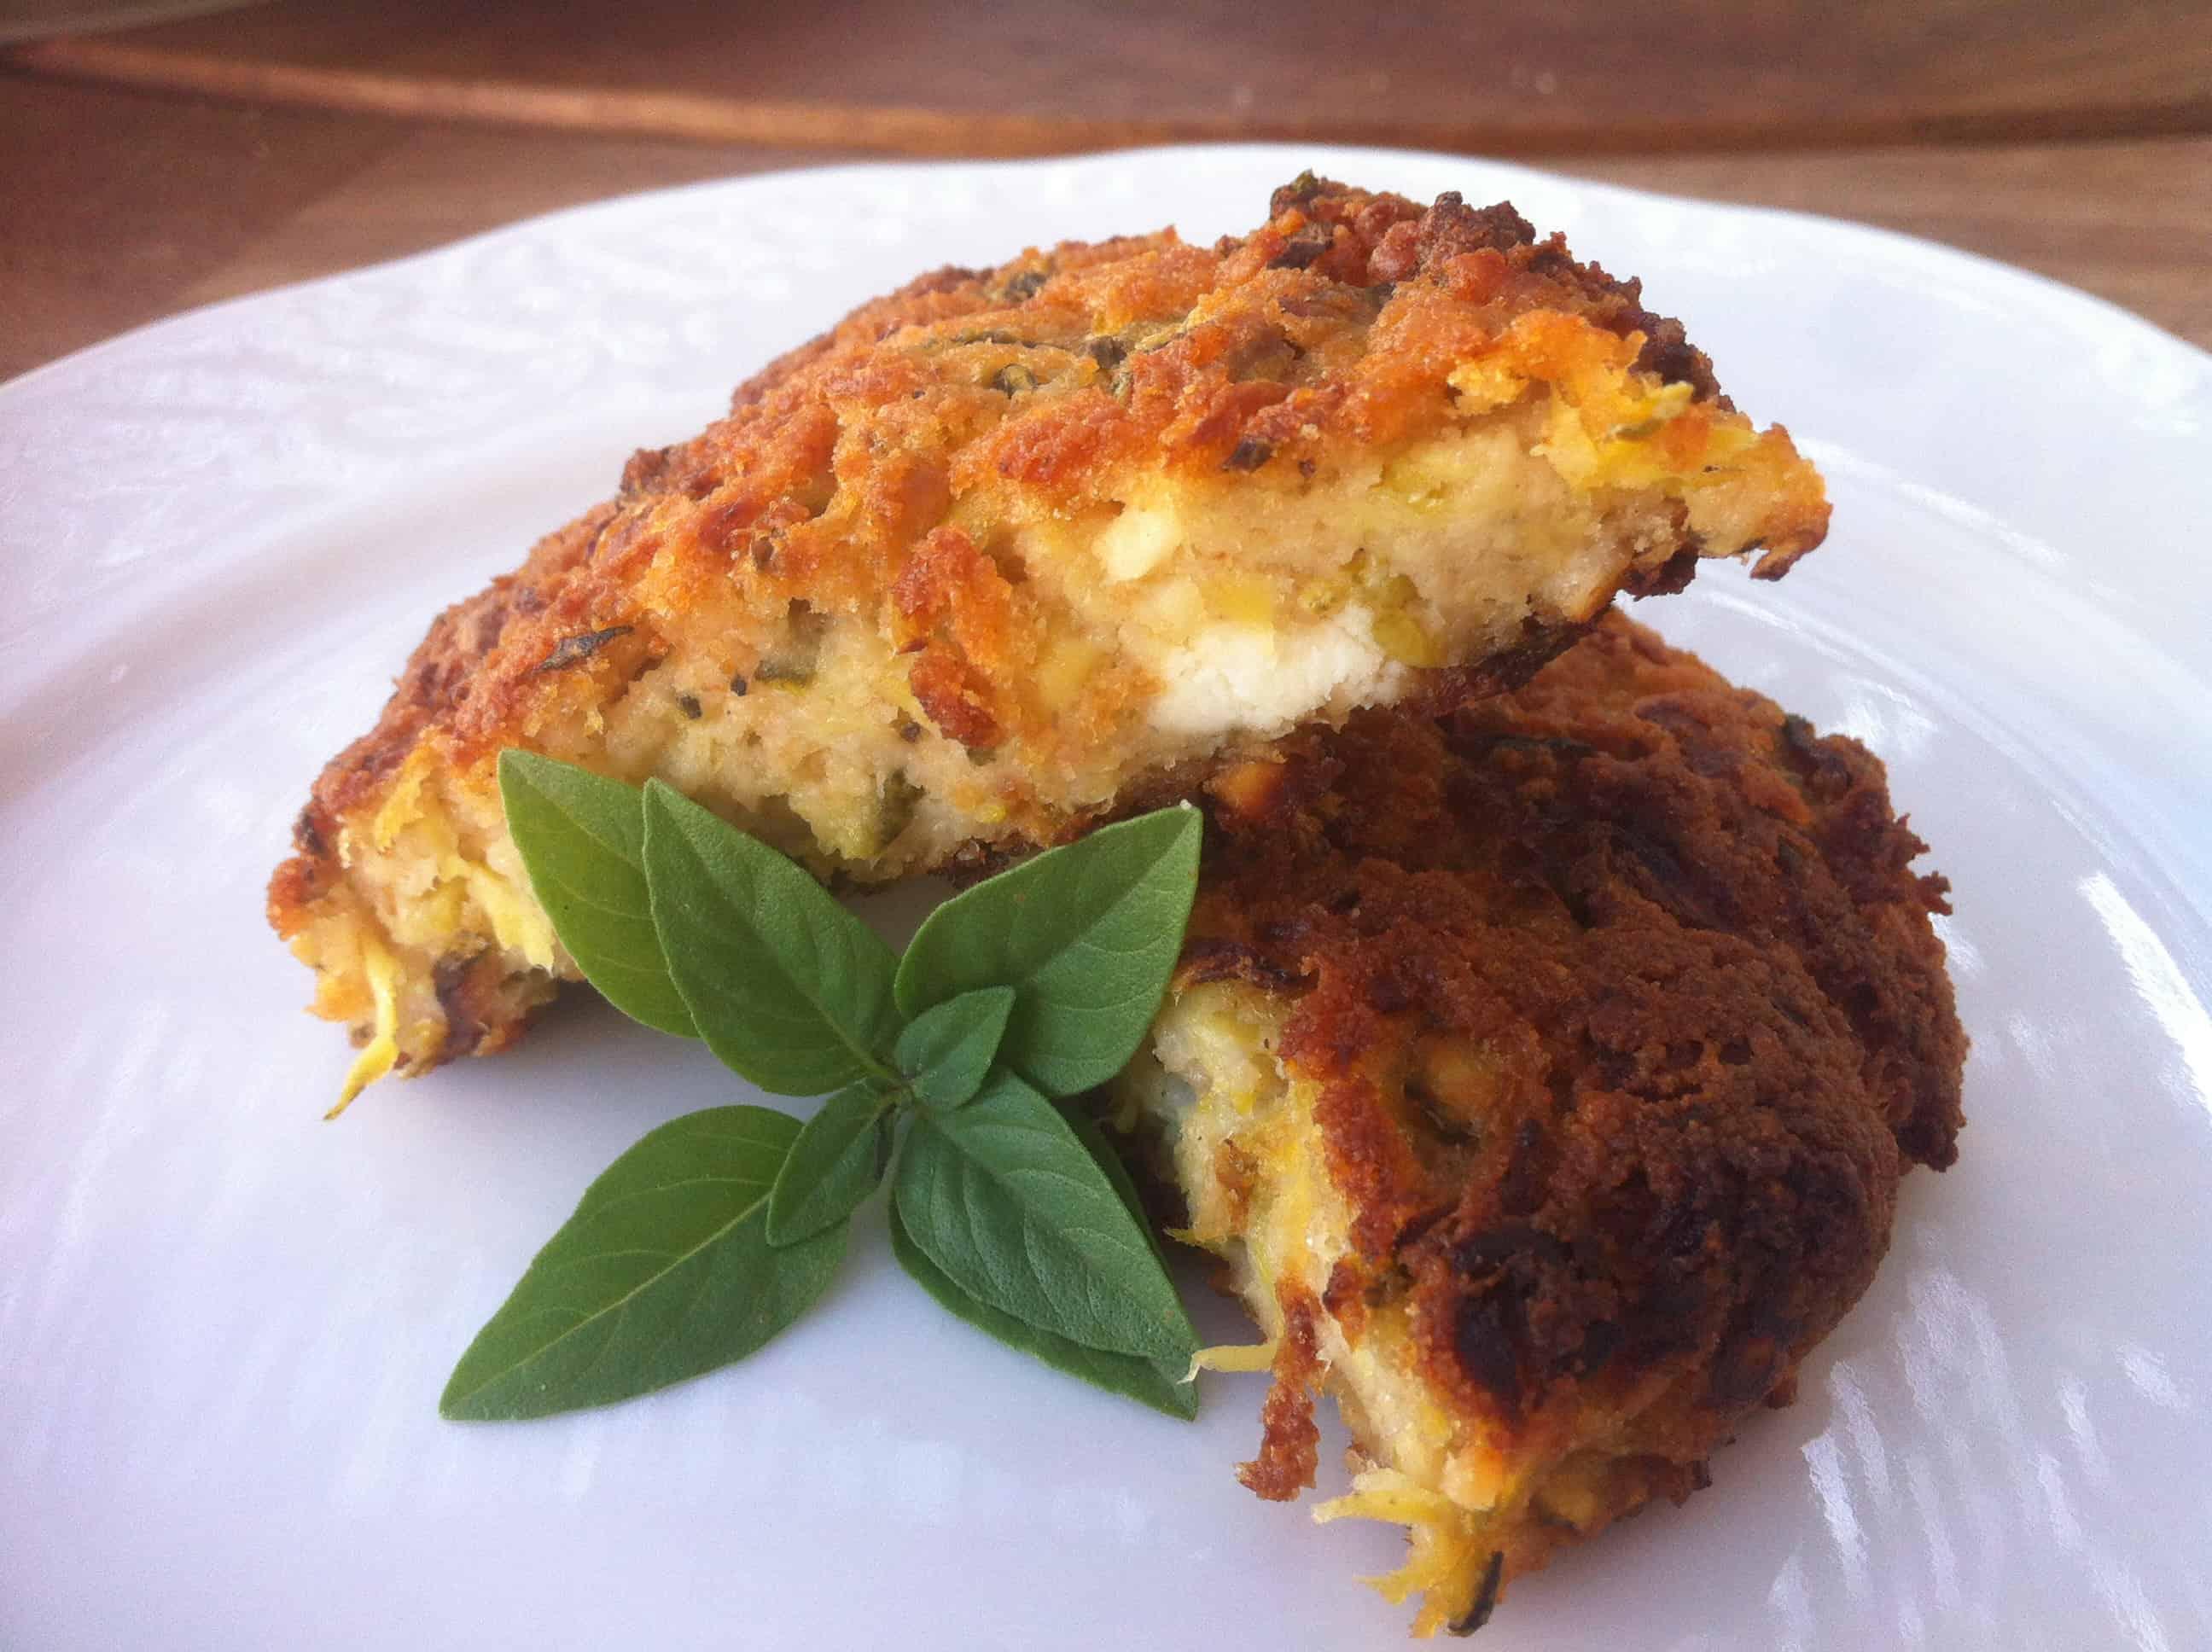 Kolokithokeftedes (Fried Zucchini Balls or Courgette) - My Greek Dish